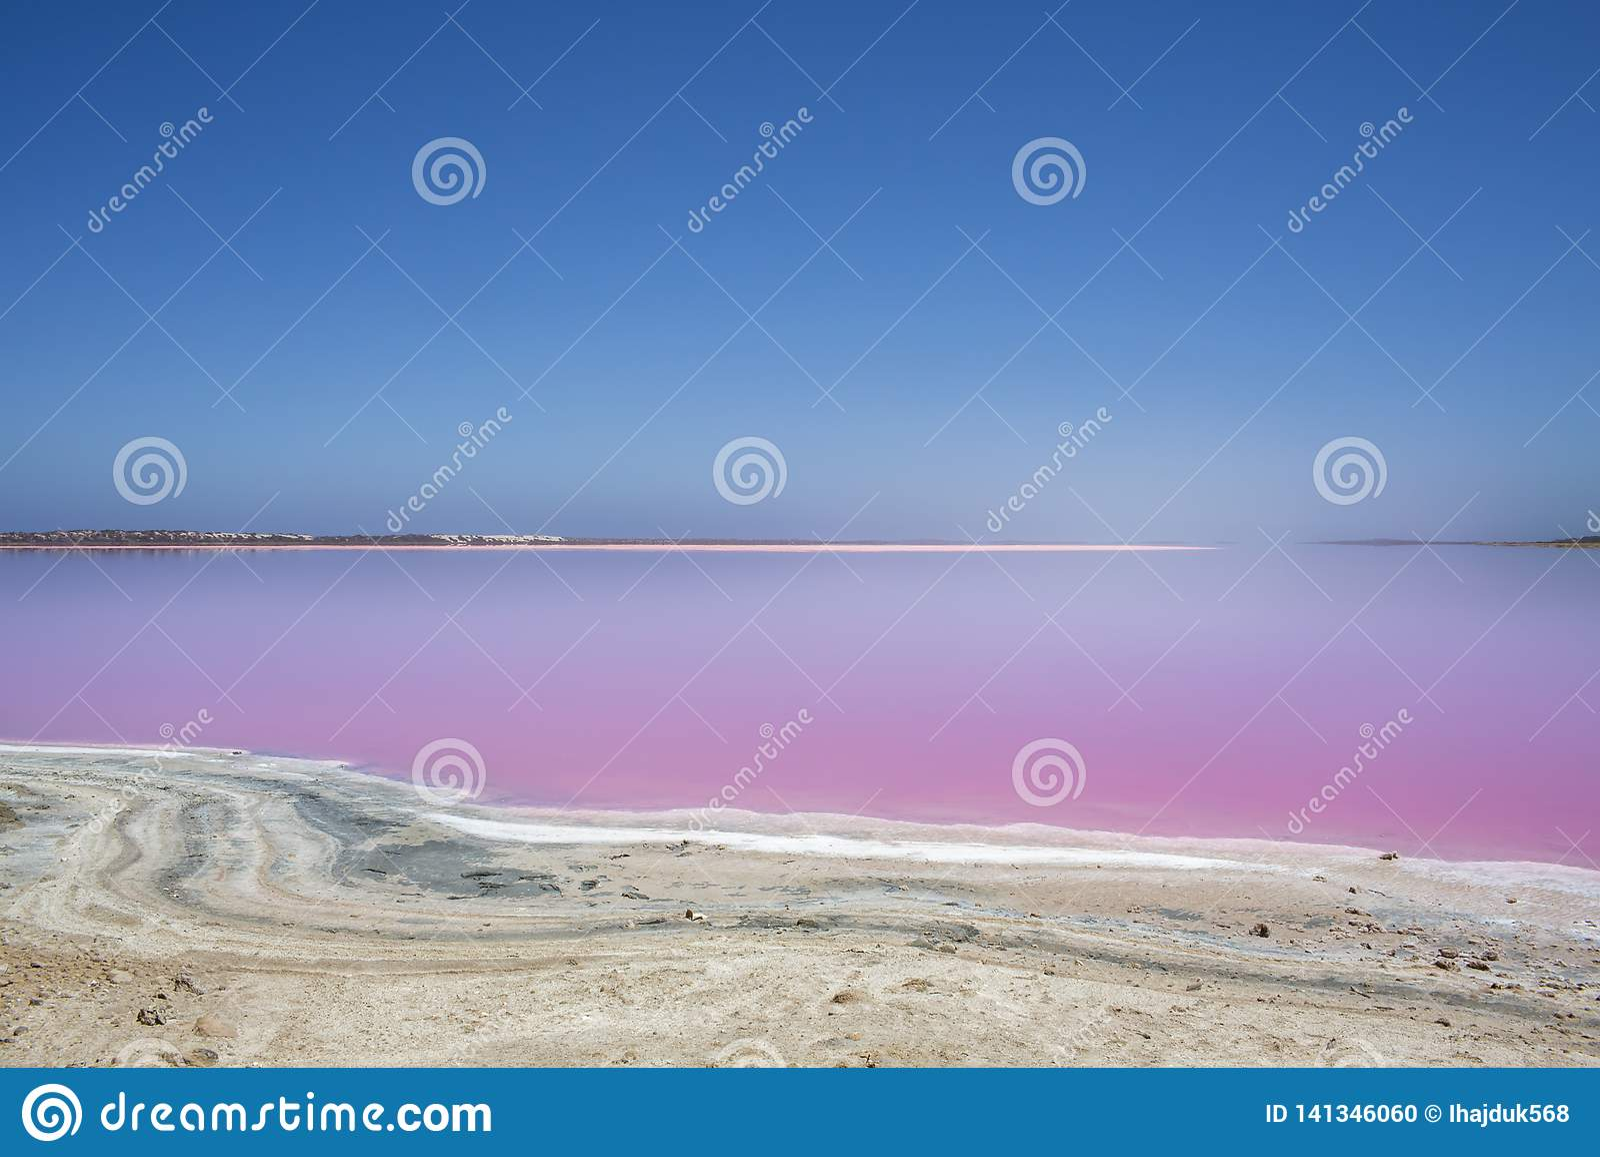 Pink lake Hut Lagoon at Port Gregory, Western Australia, Australia